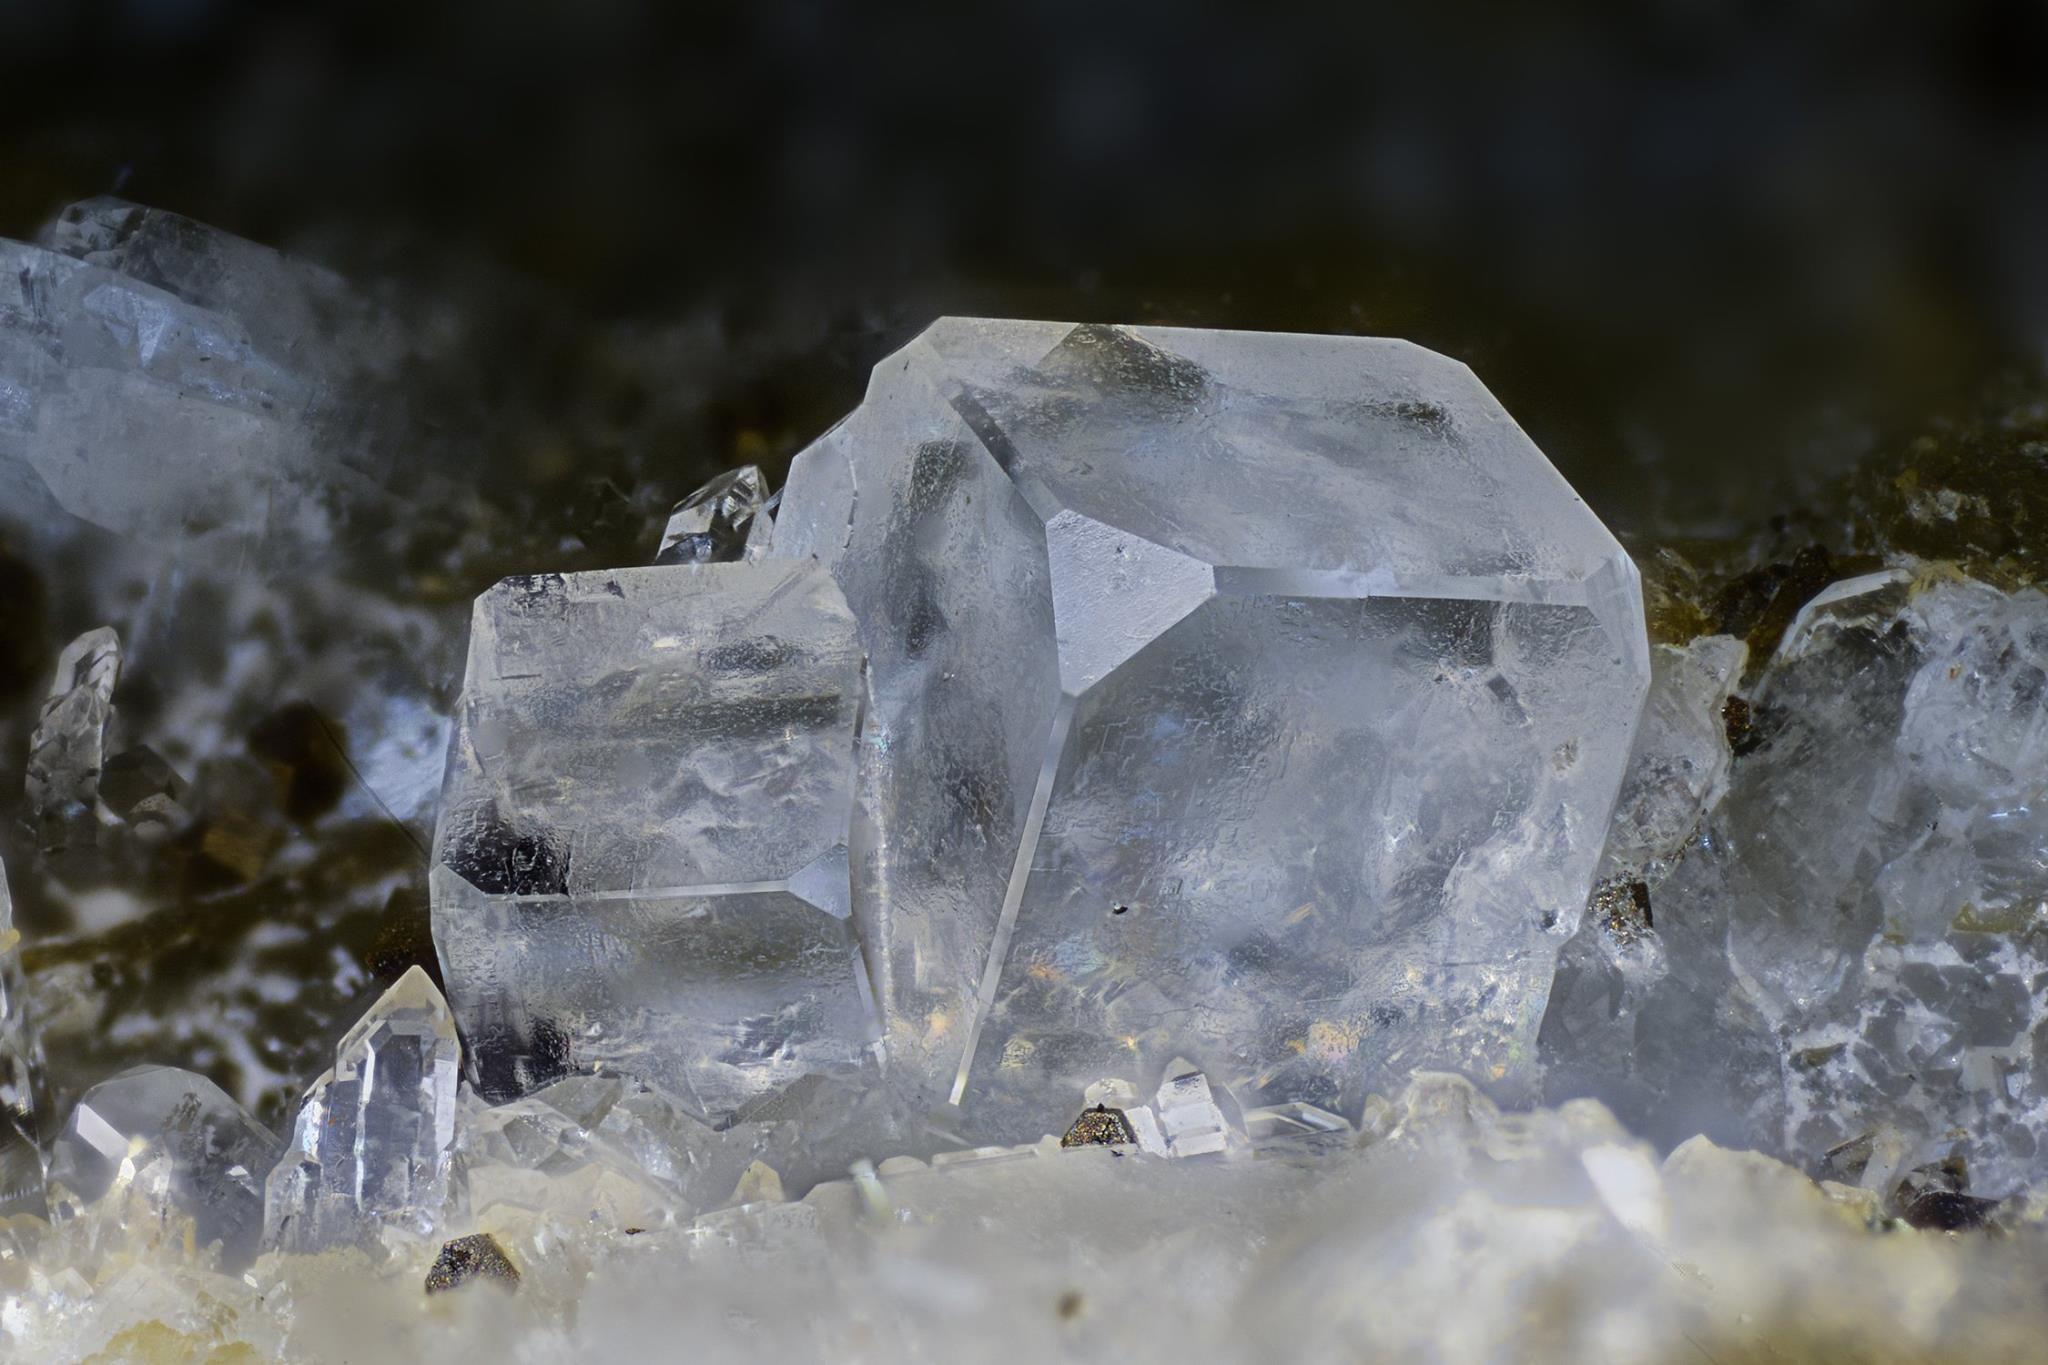 Fluorite. Pret Basso quarry, Montoso, Bagnolo Piemonte, Cuneo Province, Piedmont, Italie FOV=2.9 mm Collection et photo Giuseppe Finello